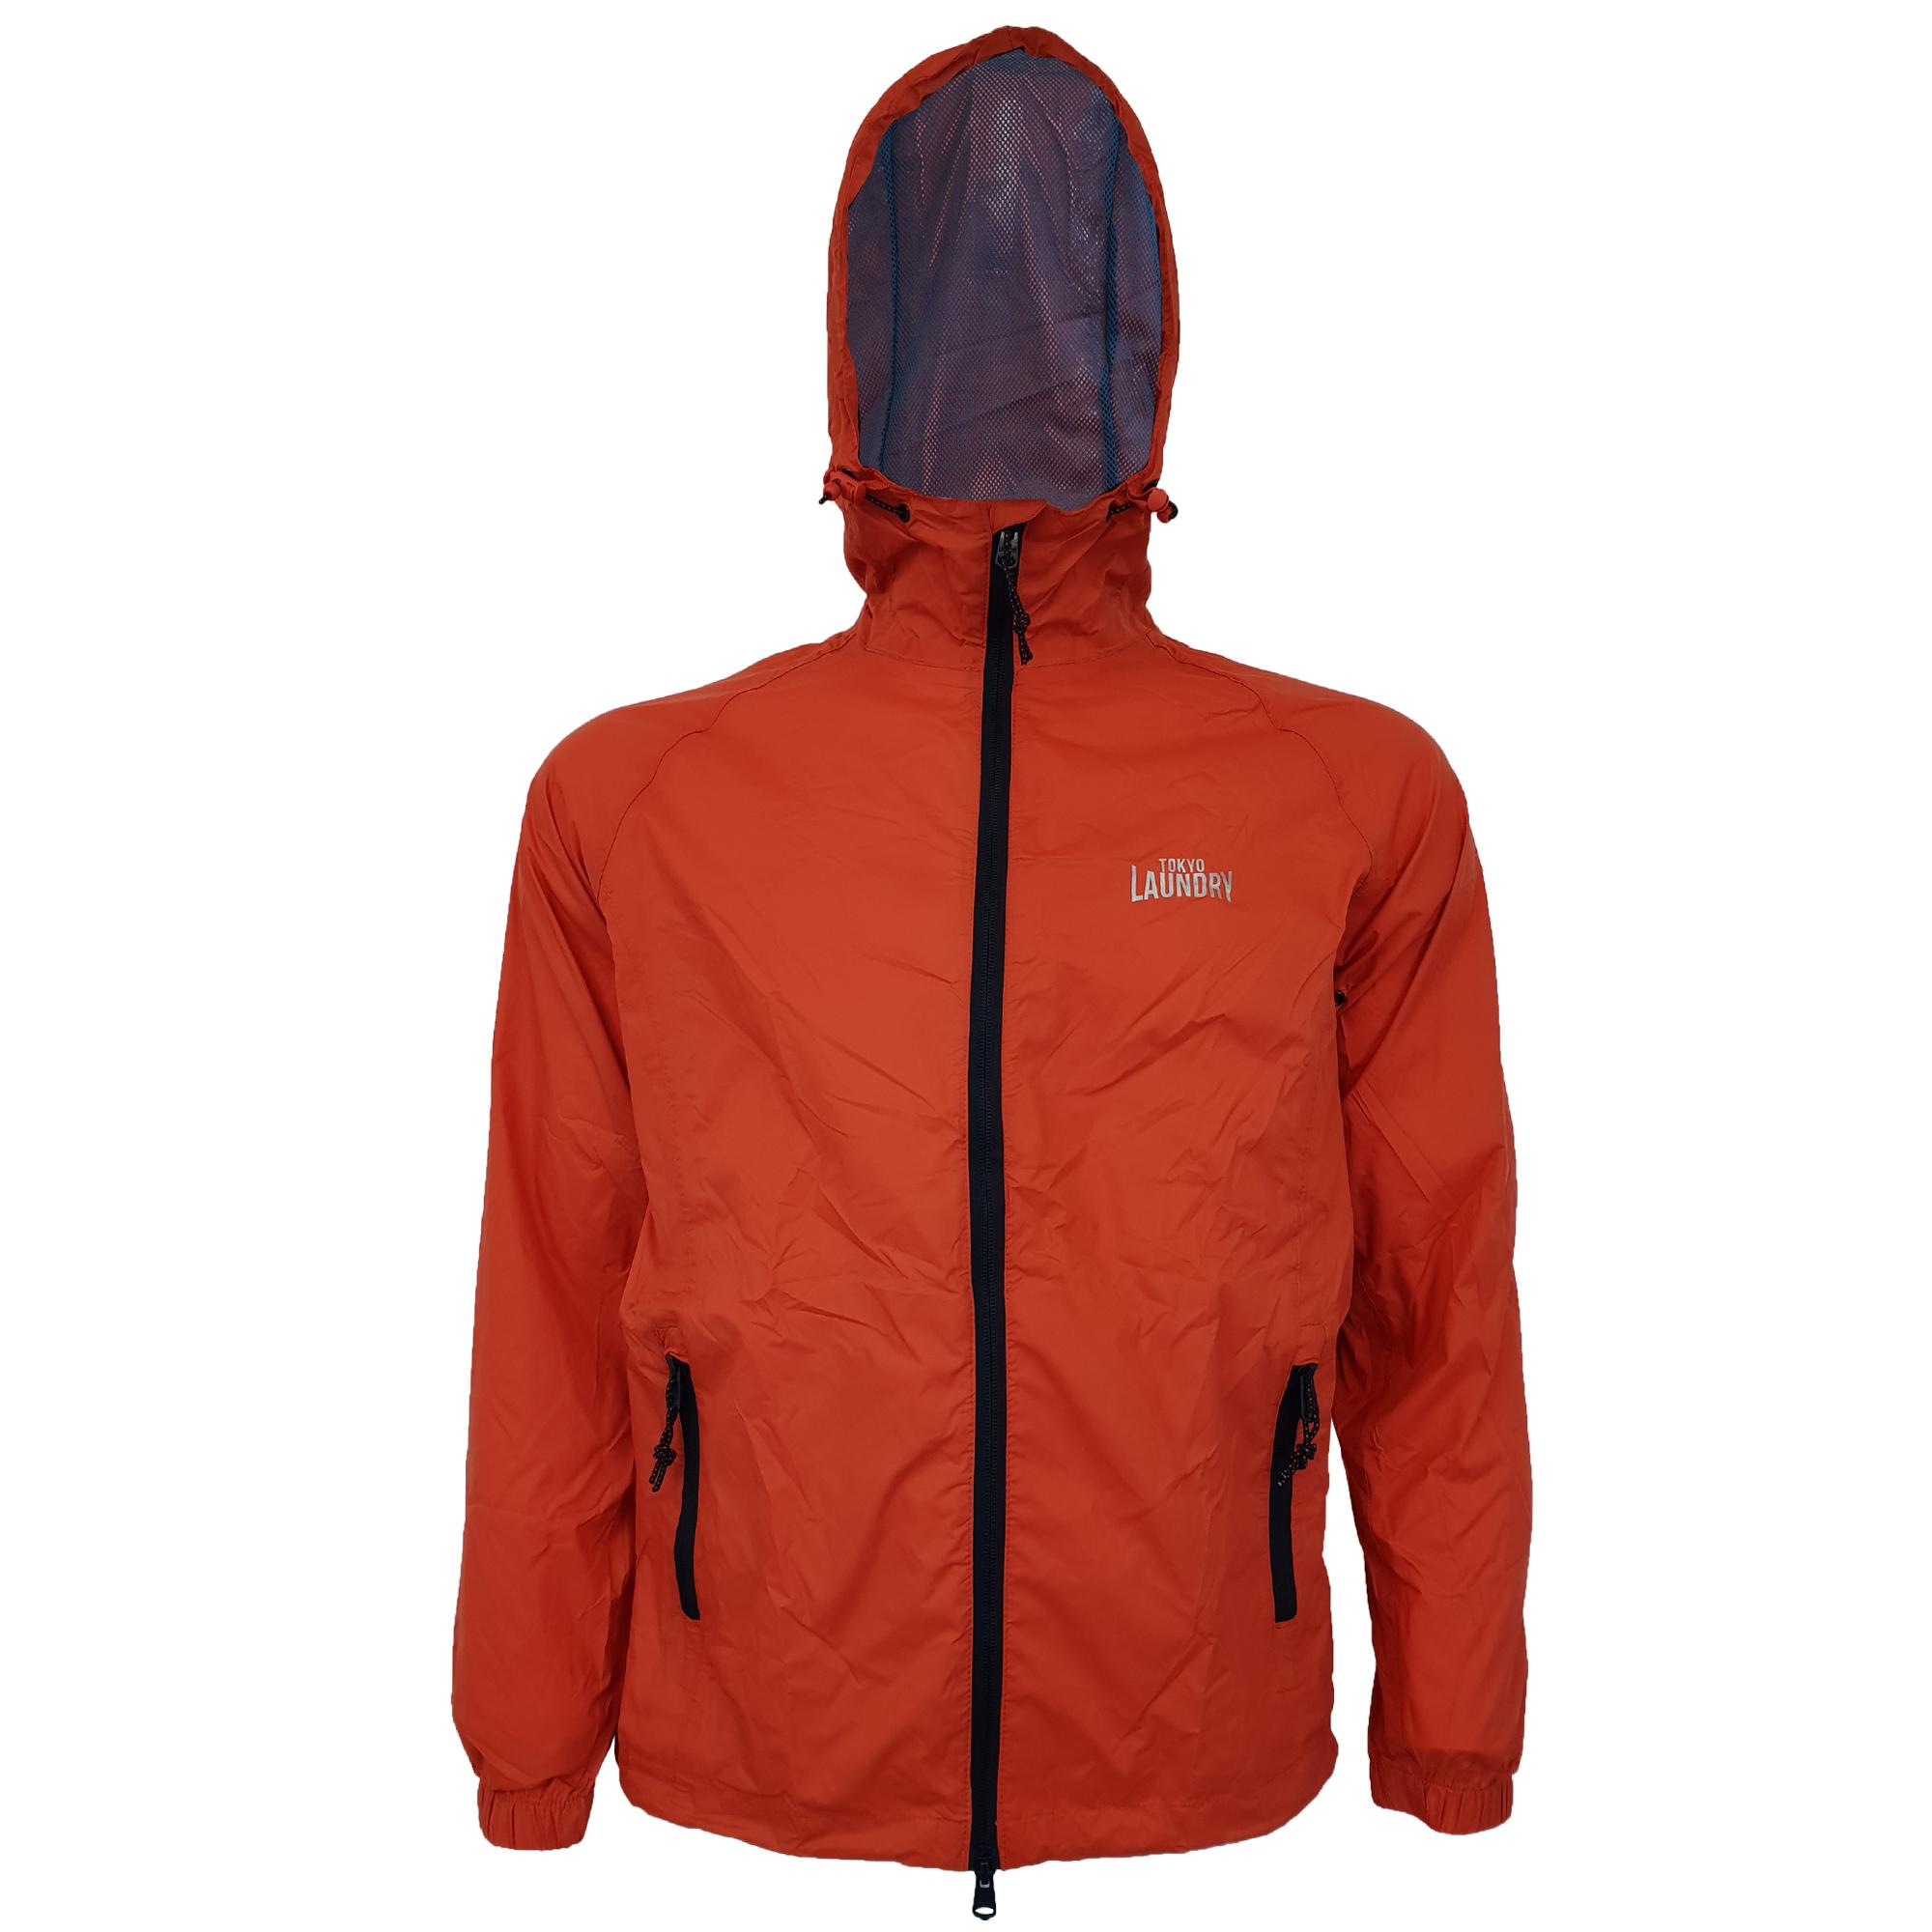 Mens-Kagool-Breathable-Hooded-Jacket-Tokyo-Laundry-Waterproof-Coat-Windproof-New thumbnail 11